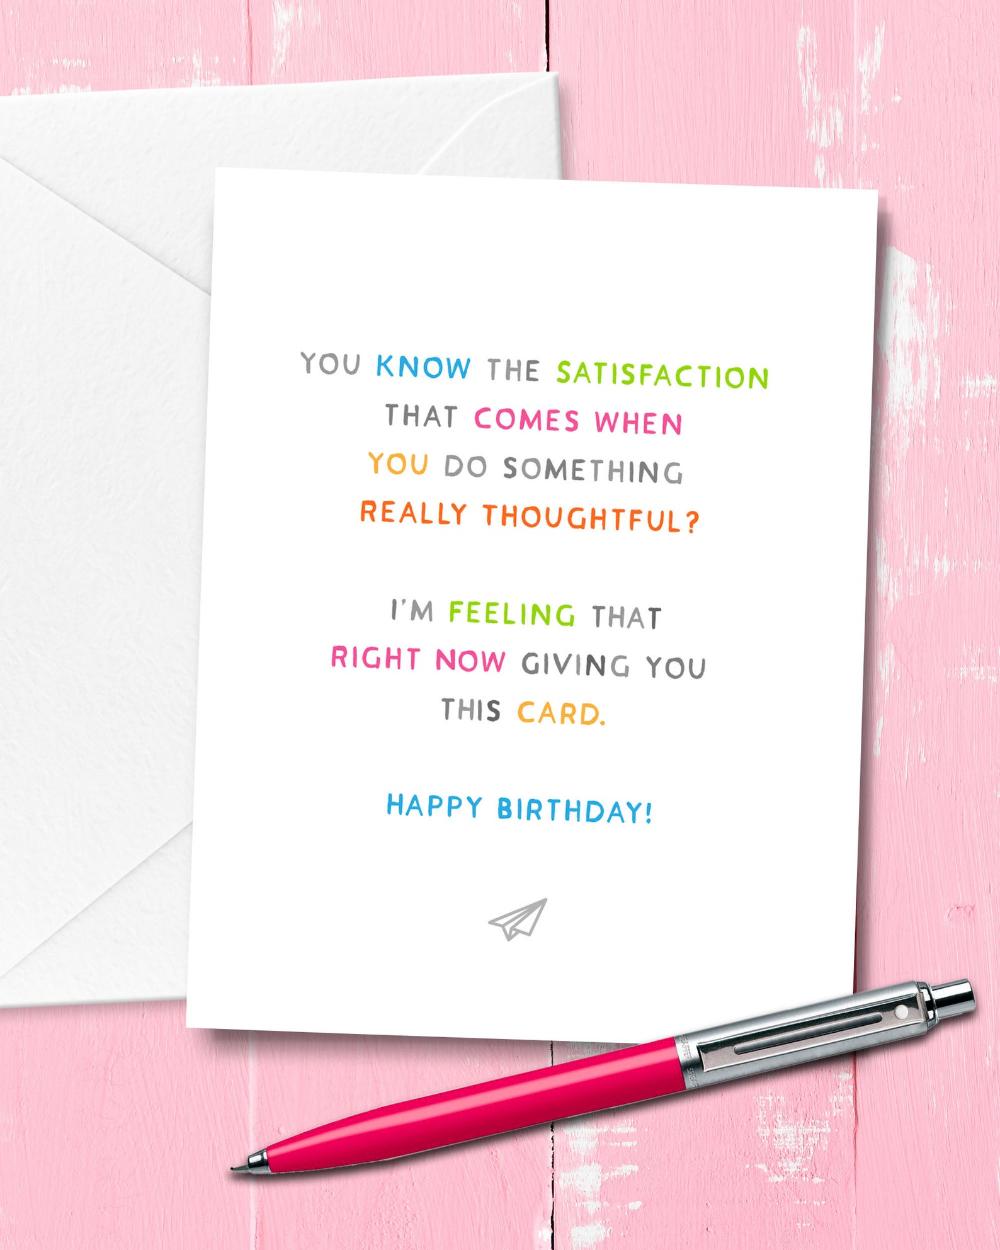 Humorous Birthday Card Funny Friend Birthday Thoughtful Card Etsy In 2021 Birthday Cards Funny Friend Funny Friend Birthday Singing Birthday Cards